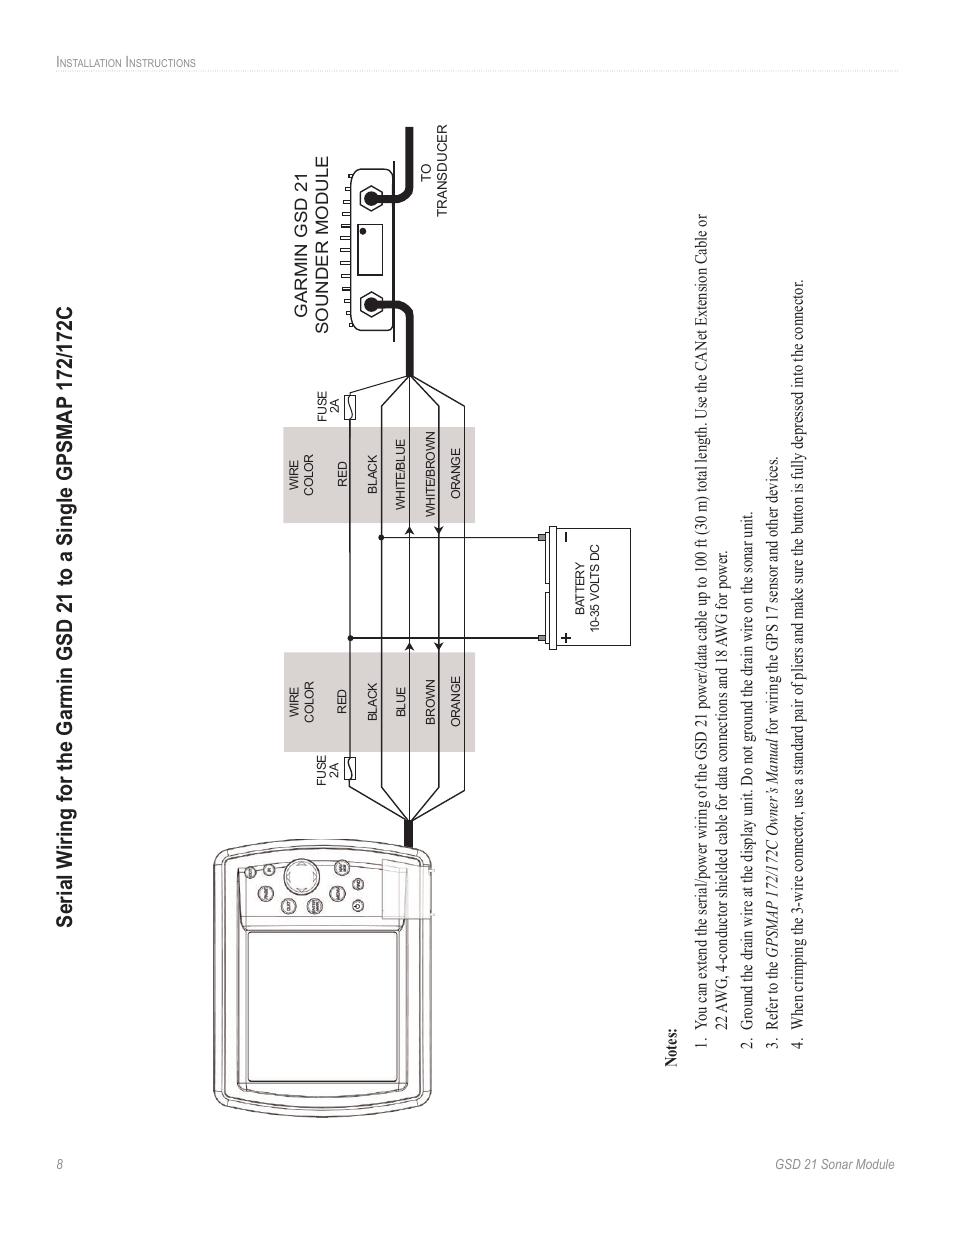 Garmin 172c Power Cable Wiring Diagram